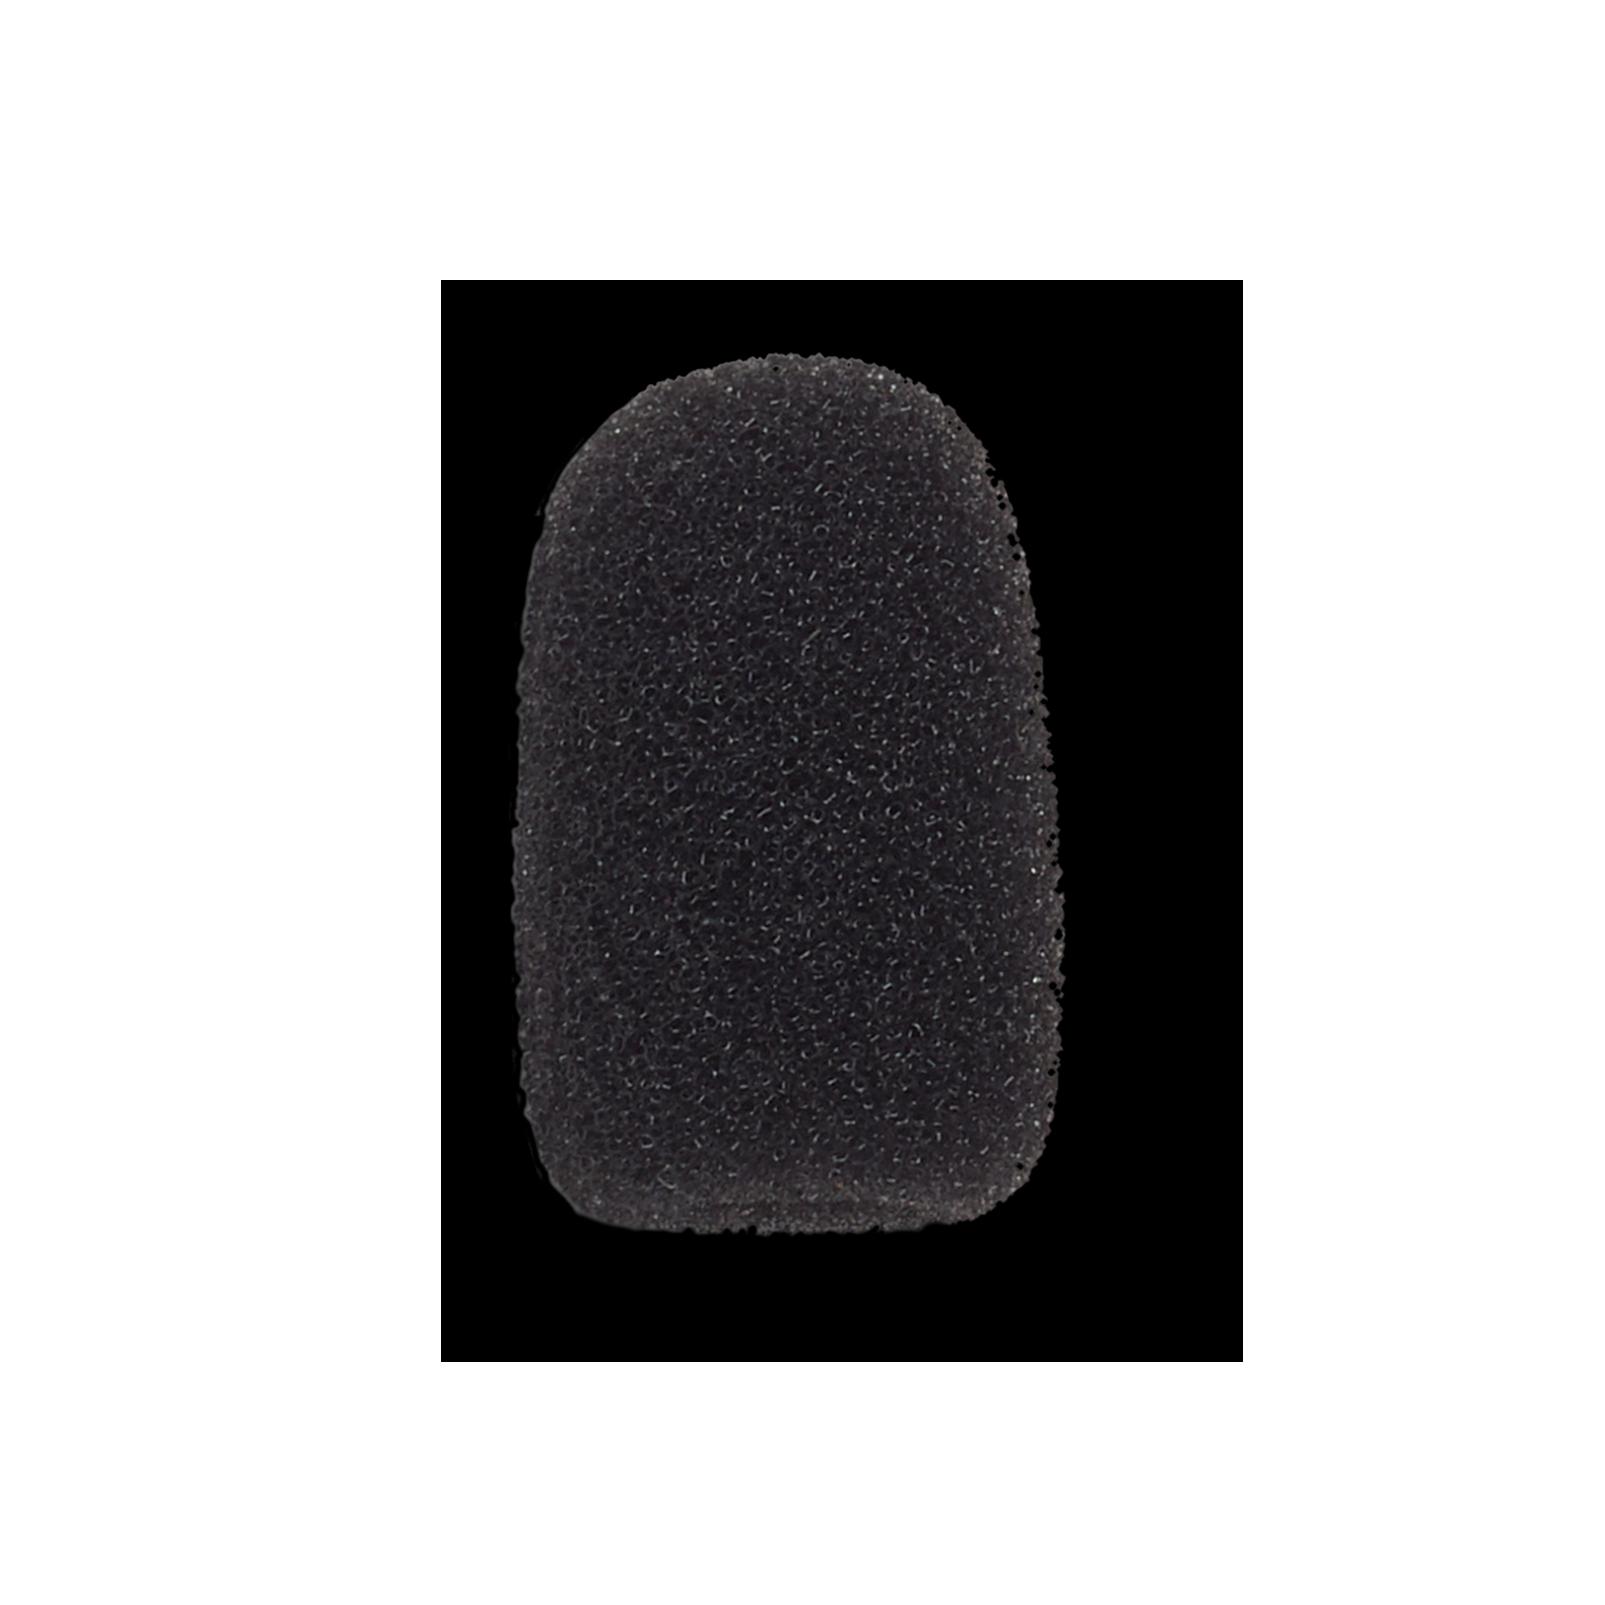 JBL Microphone sponge for Quantum 200/300 - Black - Wind cap - Hero